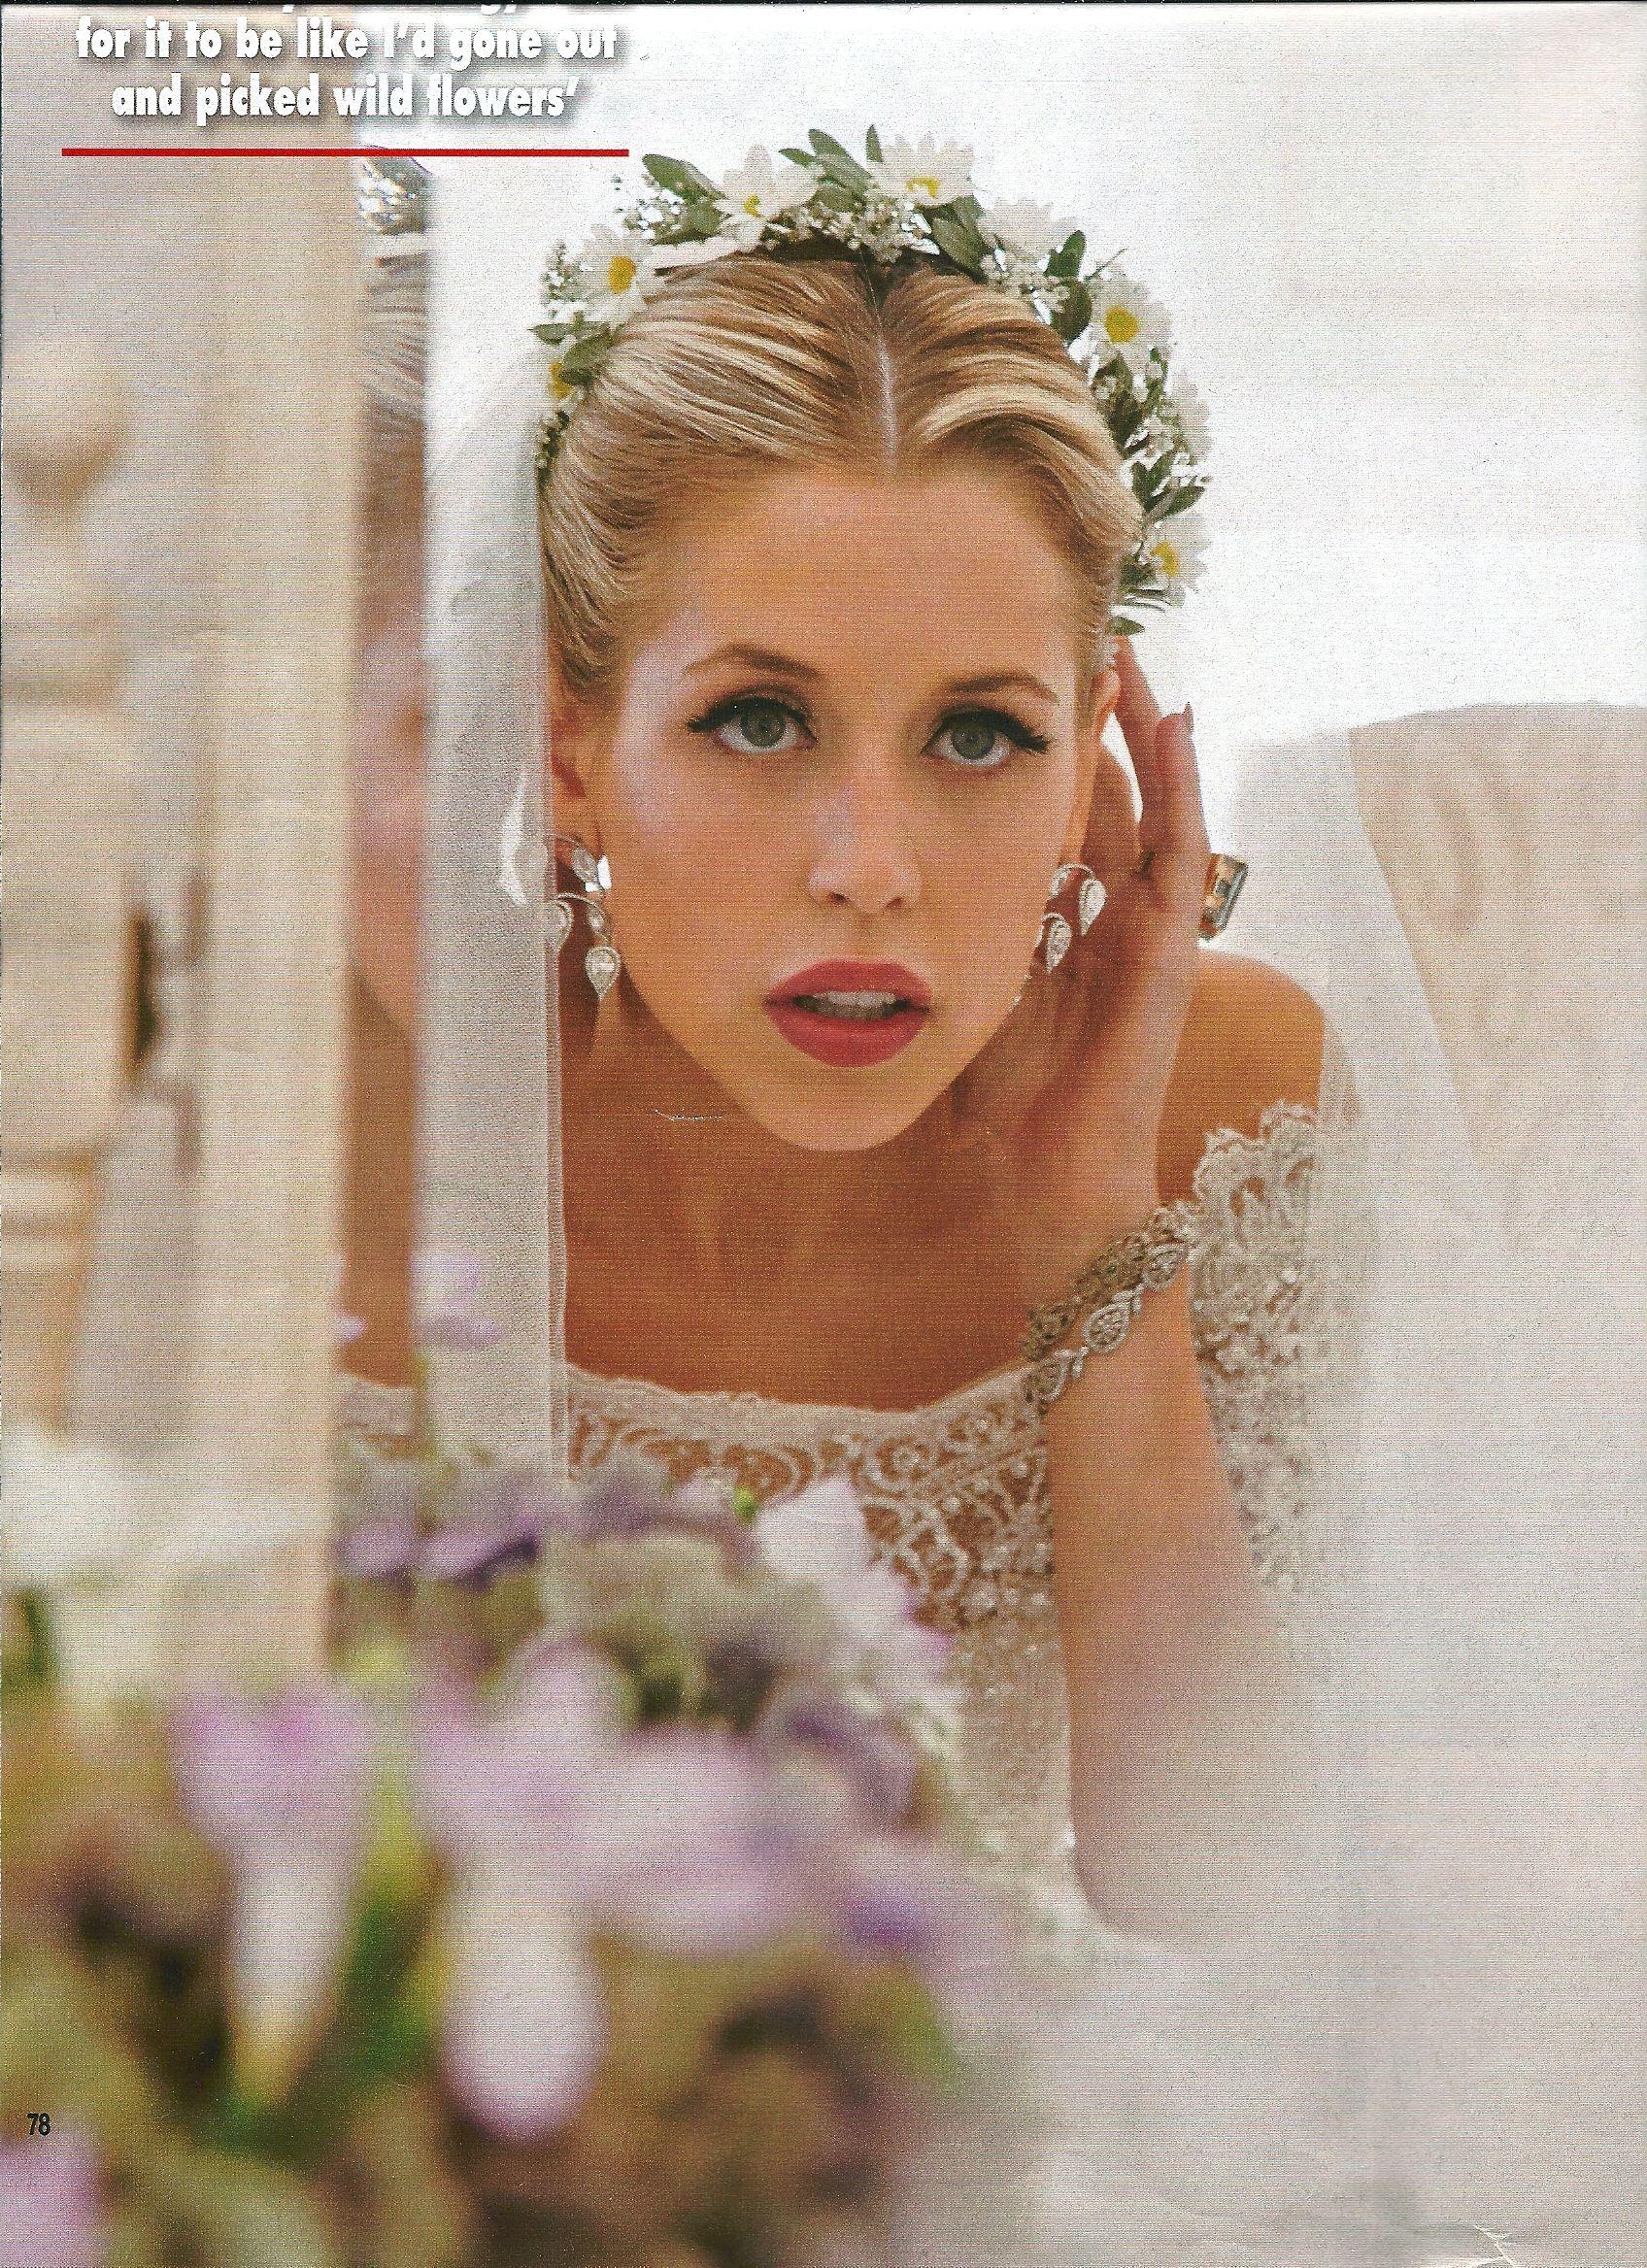 We wedding headpiece jewellery - Her Wedding Dress Headpiece Jewellery All Perfection